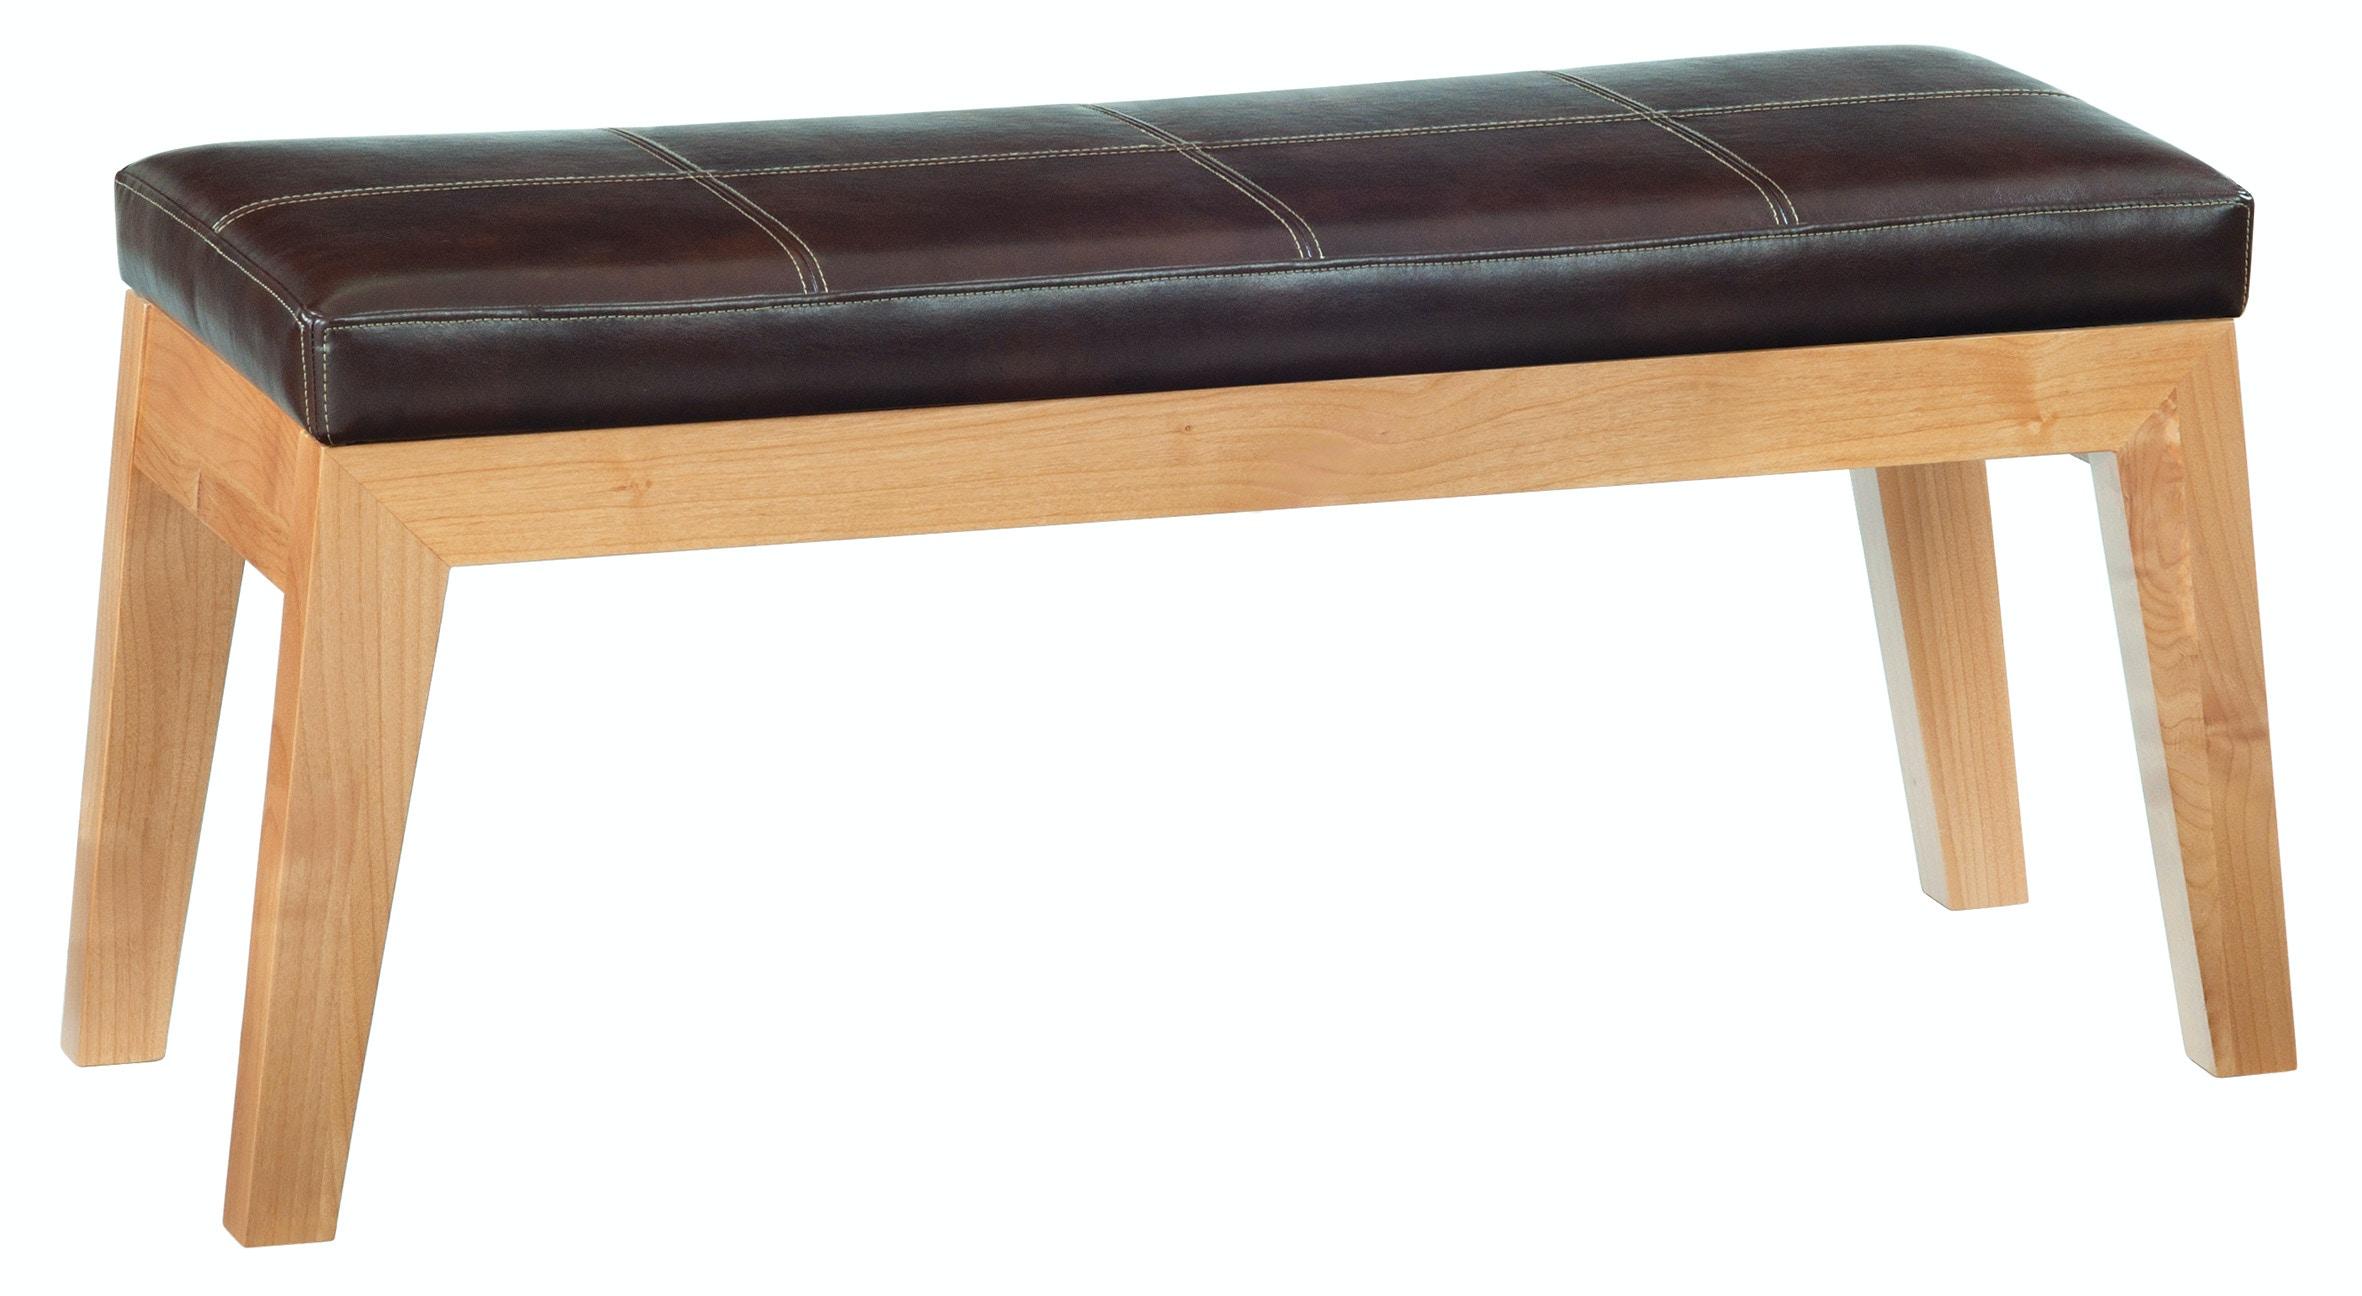 1242DUET. DUET Addison Upholstered Bench